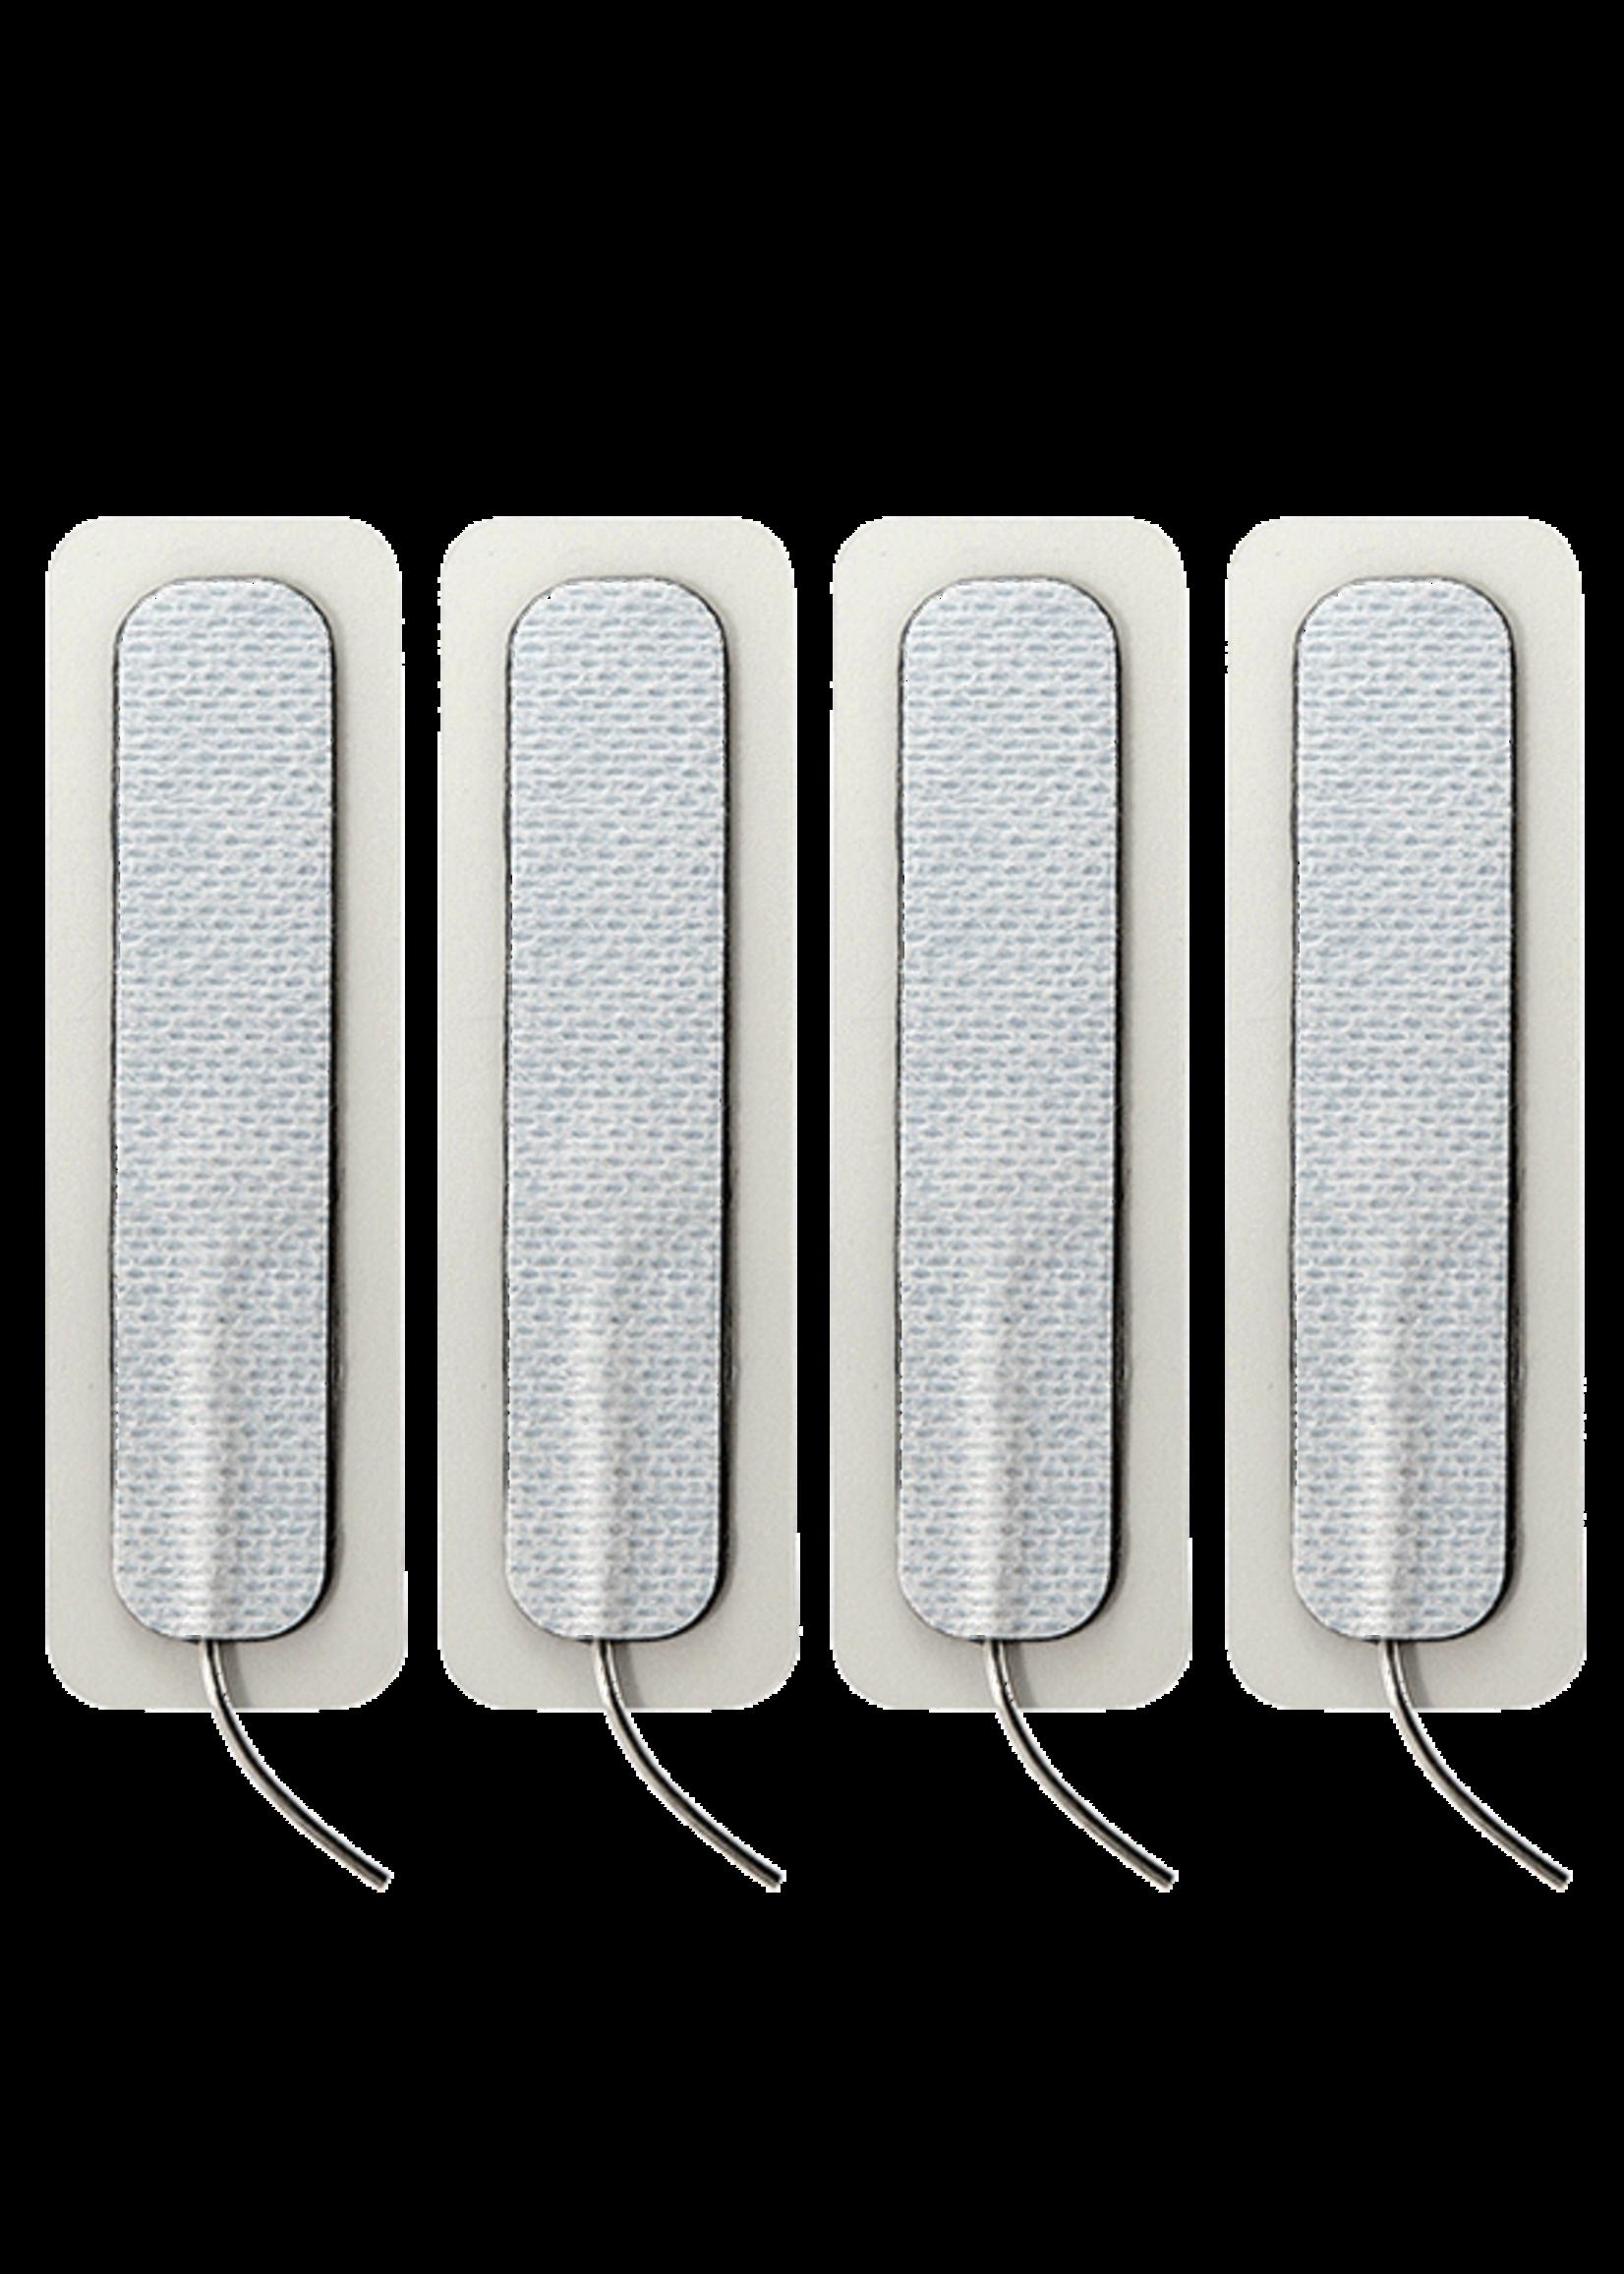 ElectraStim ElectraStim 4 x Long Self Adhesive Pads 1.5cm x 7.5cm